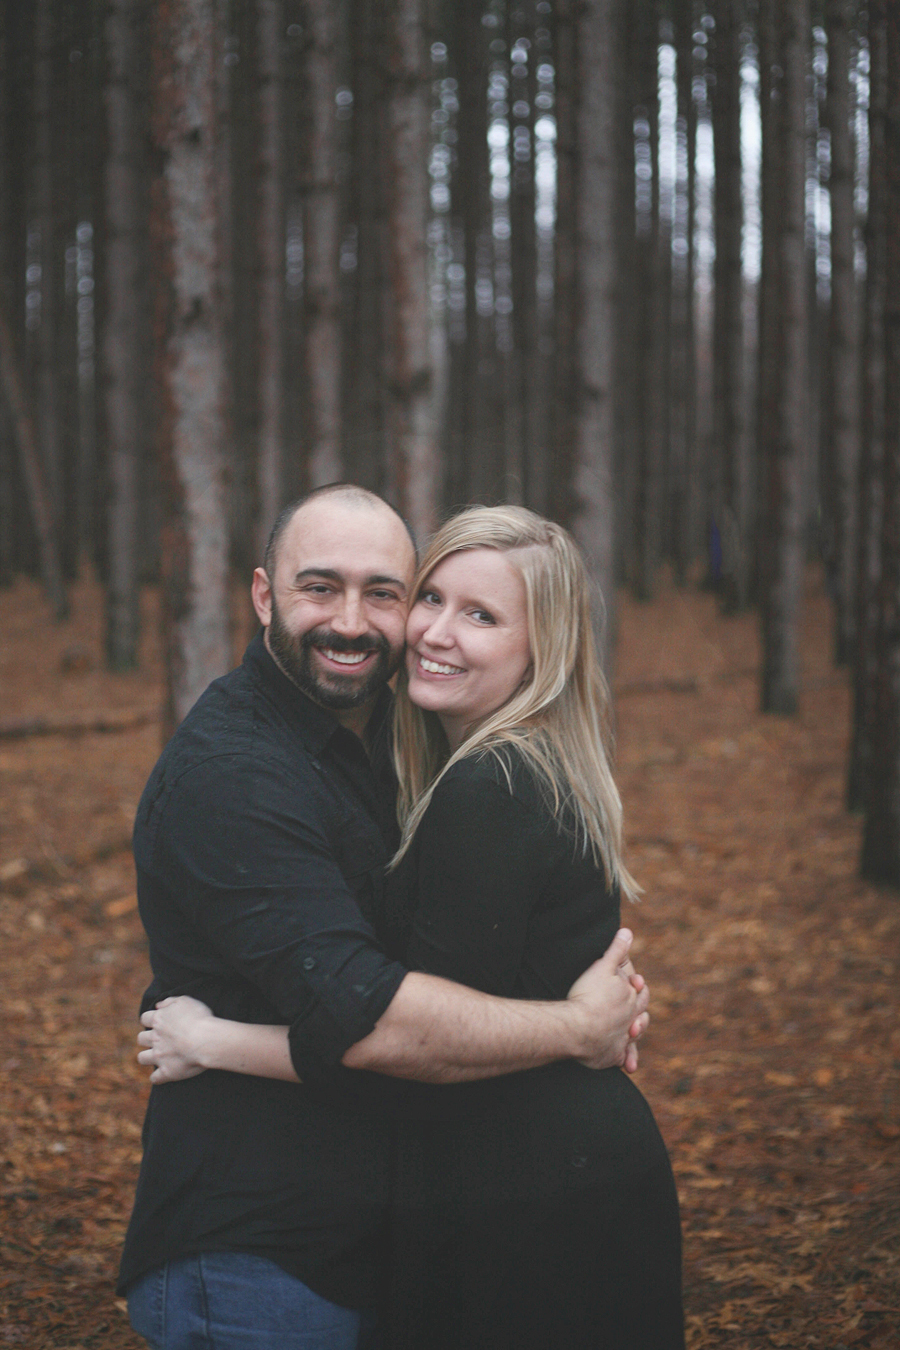 Toledo_Cleveland_Ohio_Wedding_Portrait_Photographer-55.jpg